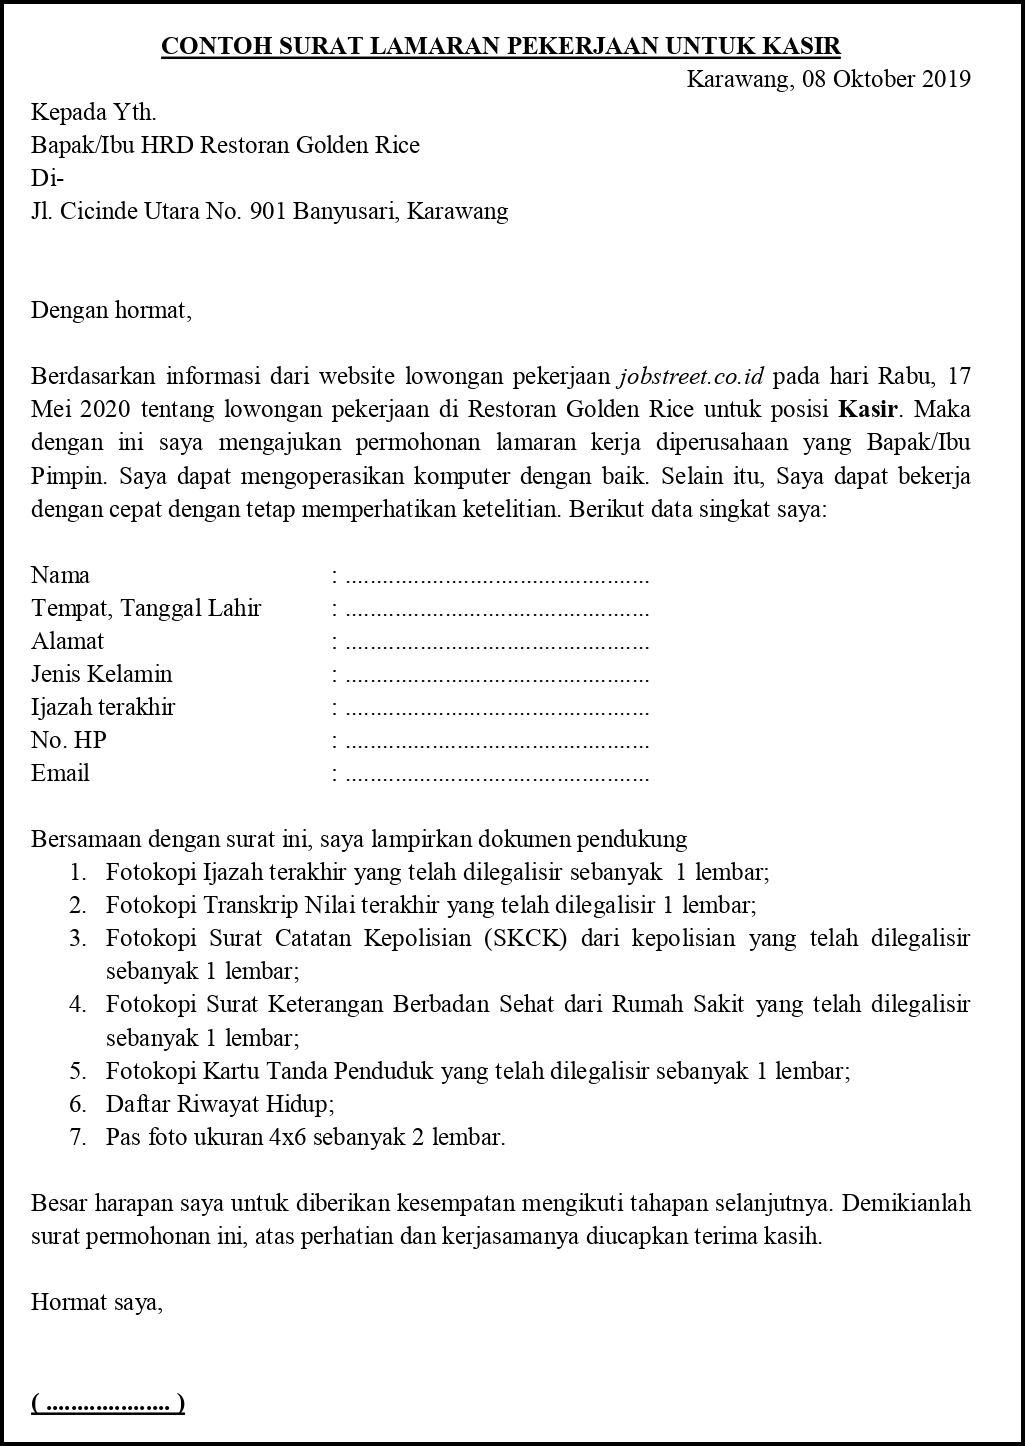 Contoh Surat Lamaran Pekerjaan Untuk Restoran Dan Cafe Kasir Barista Resepsionis Dll Tanpakoma